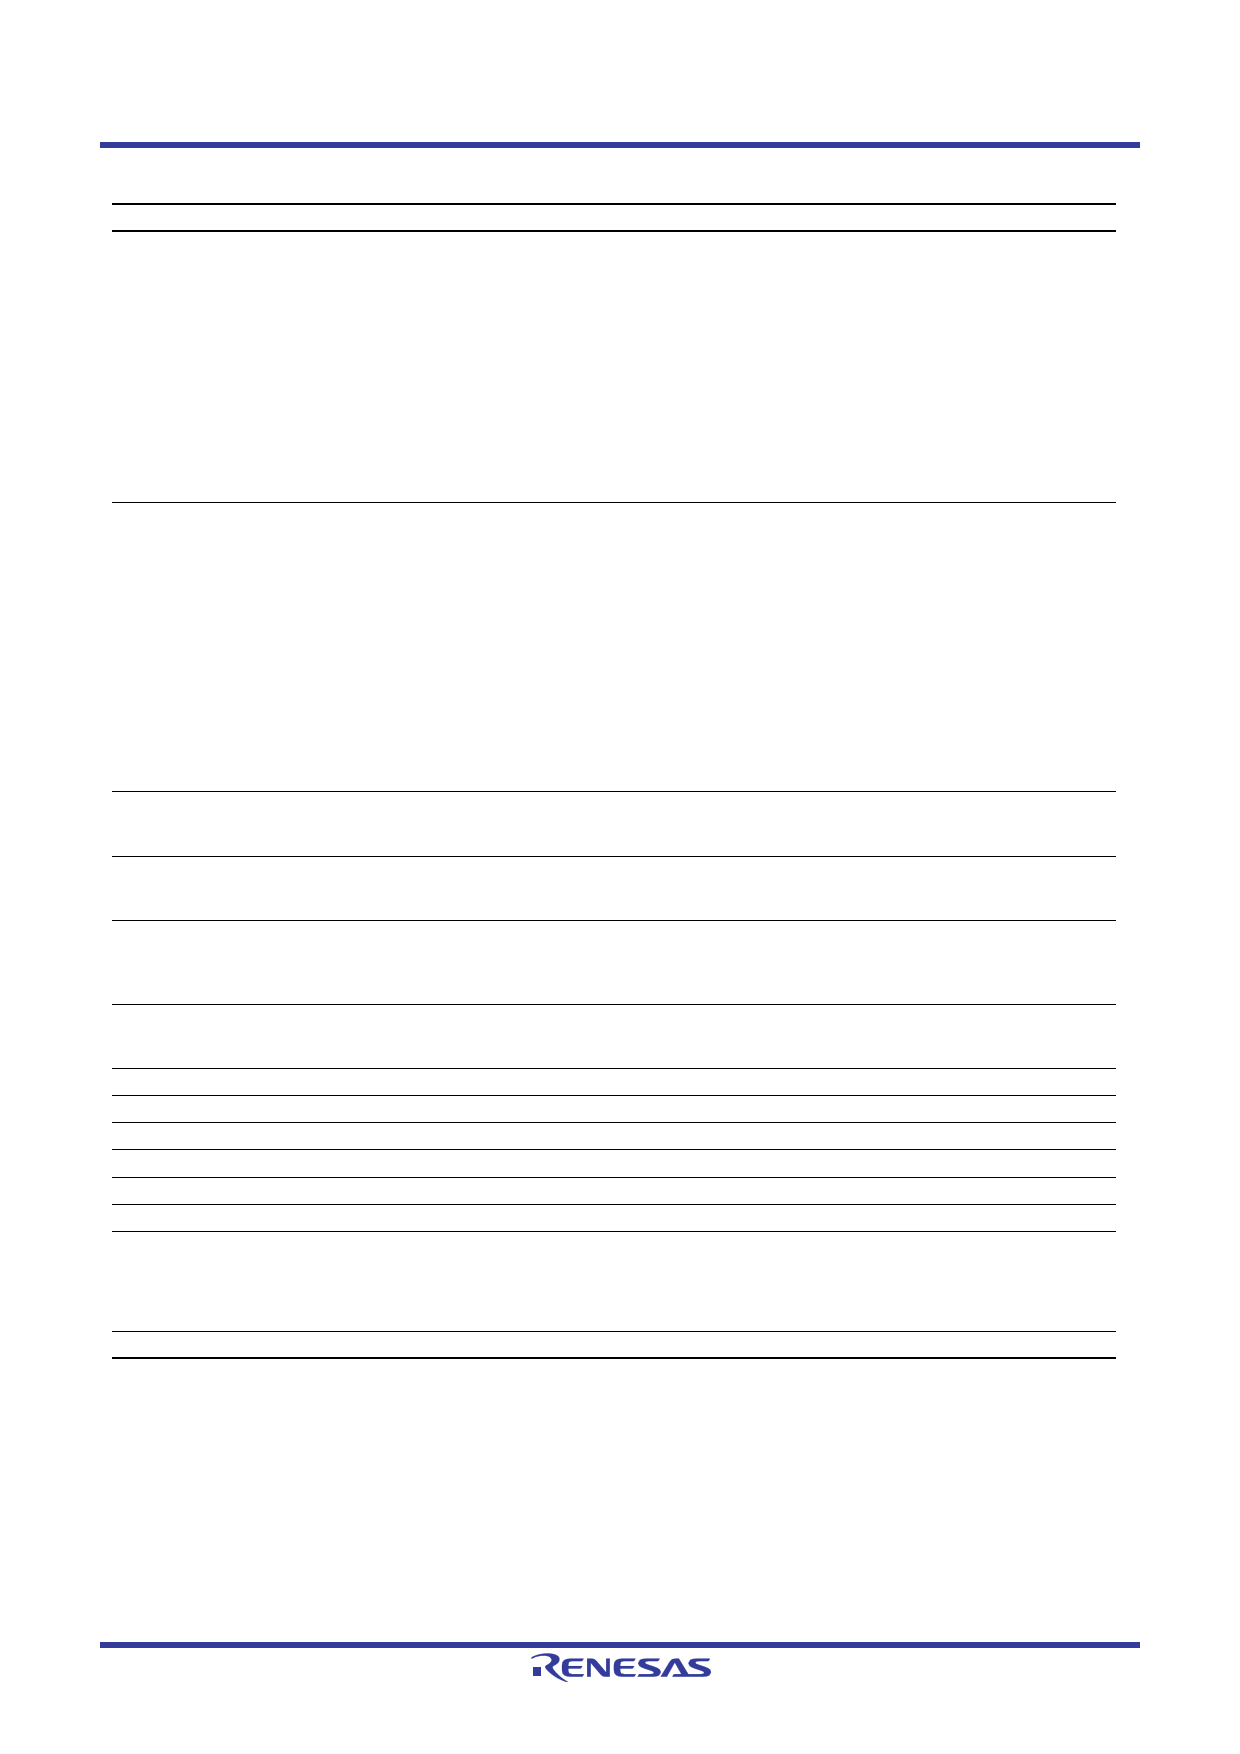 R5F51305AGFM pdf, 반도체, 판매, 대치품